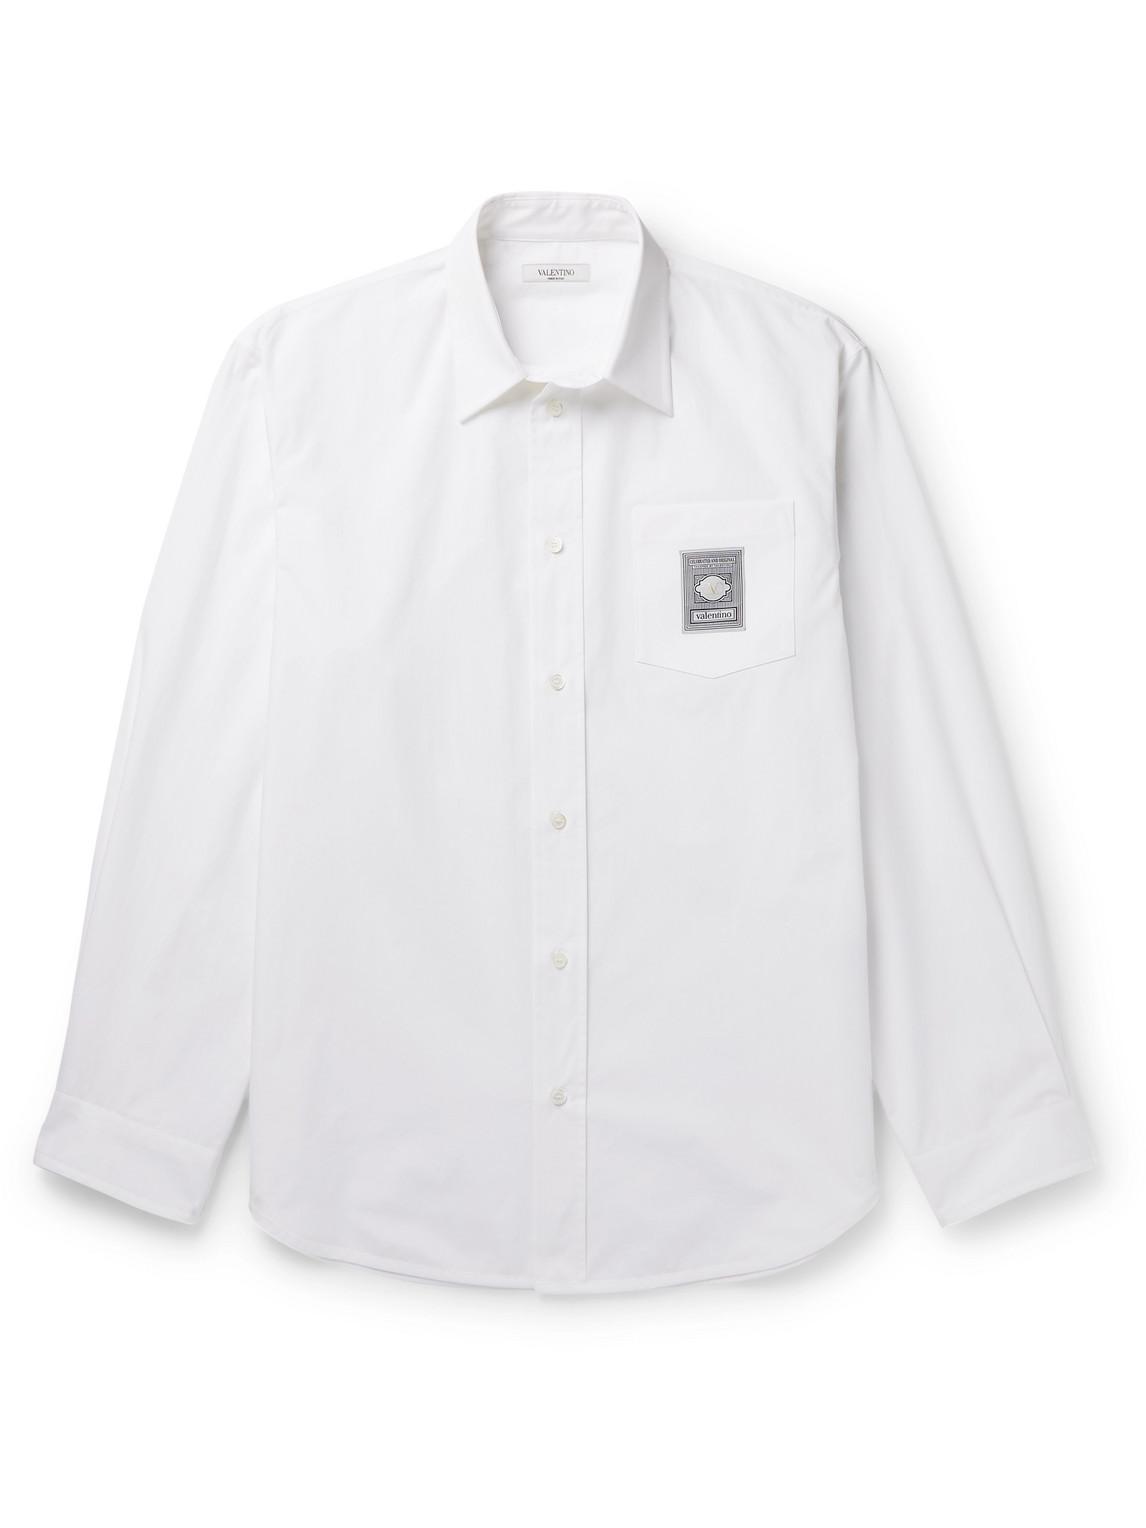 valentino - logo-appliquéd cotton-poplin shirt - men - white - eu 41